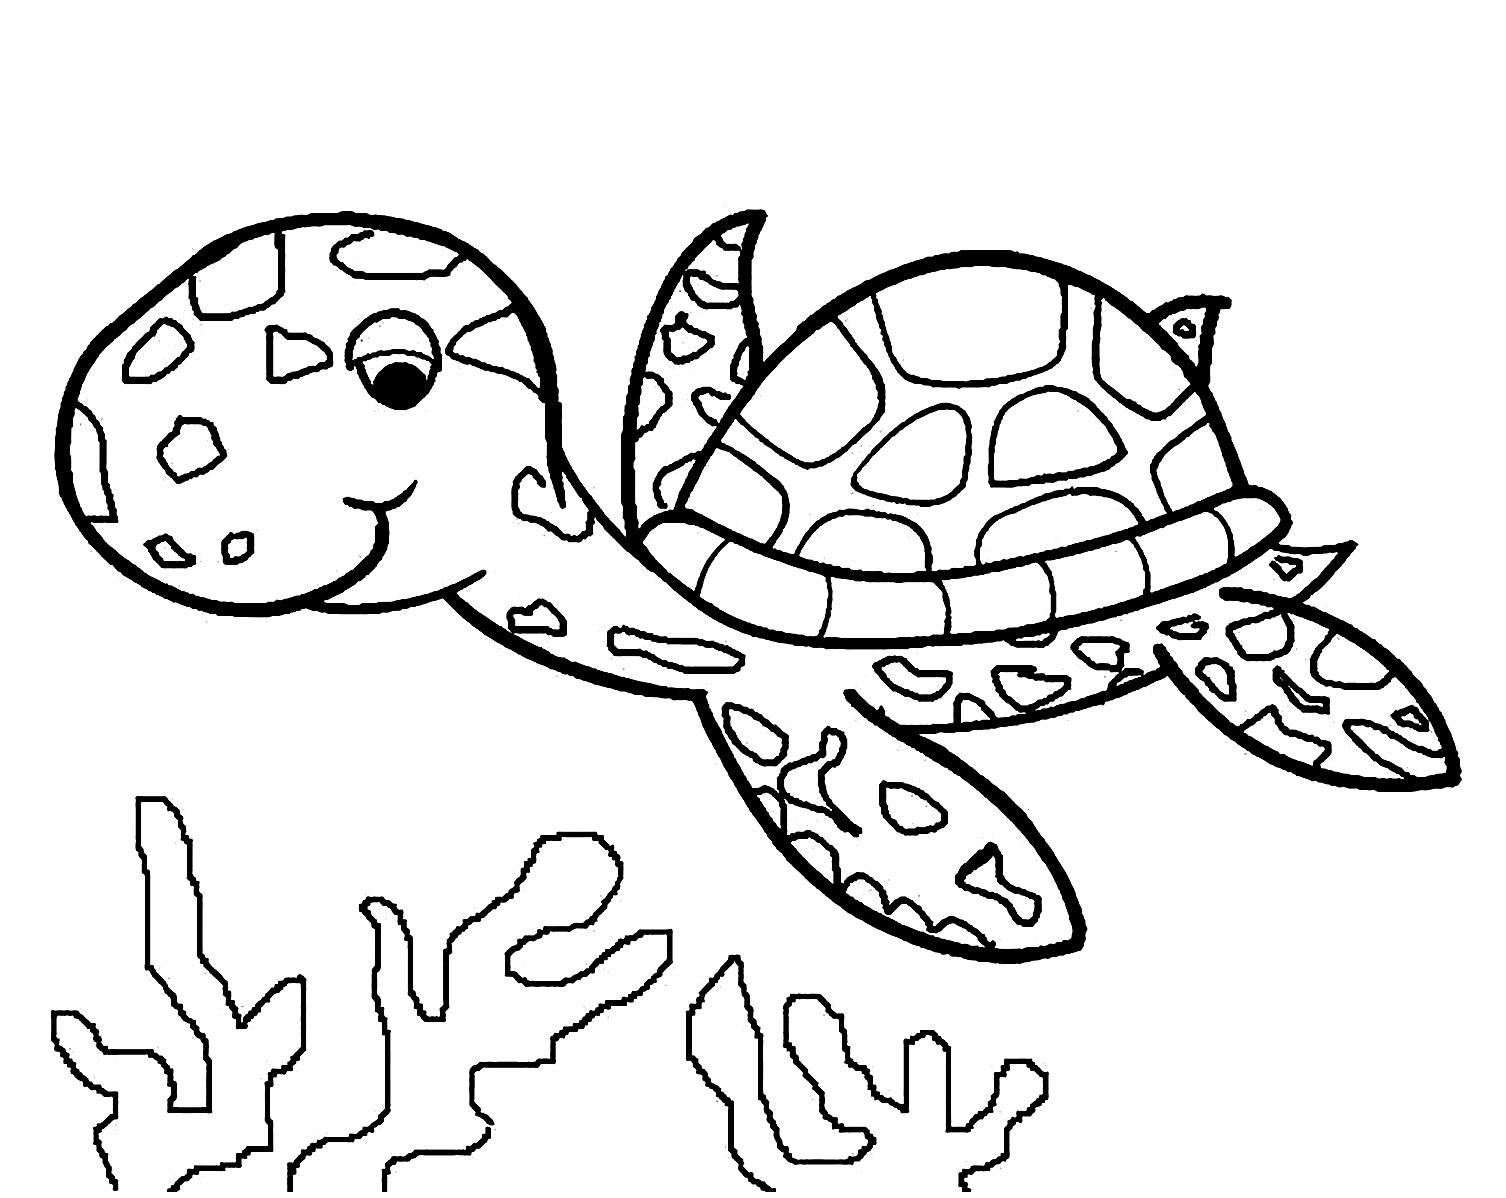 Turtles To Print